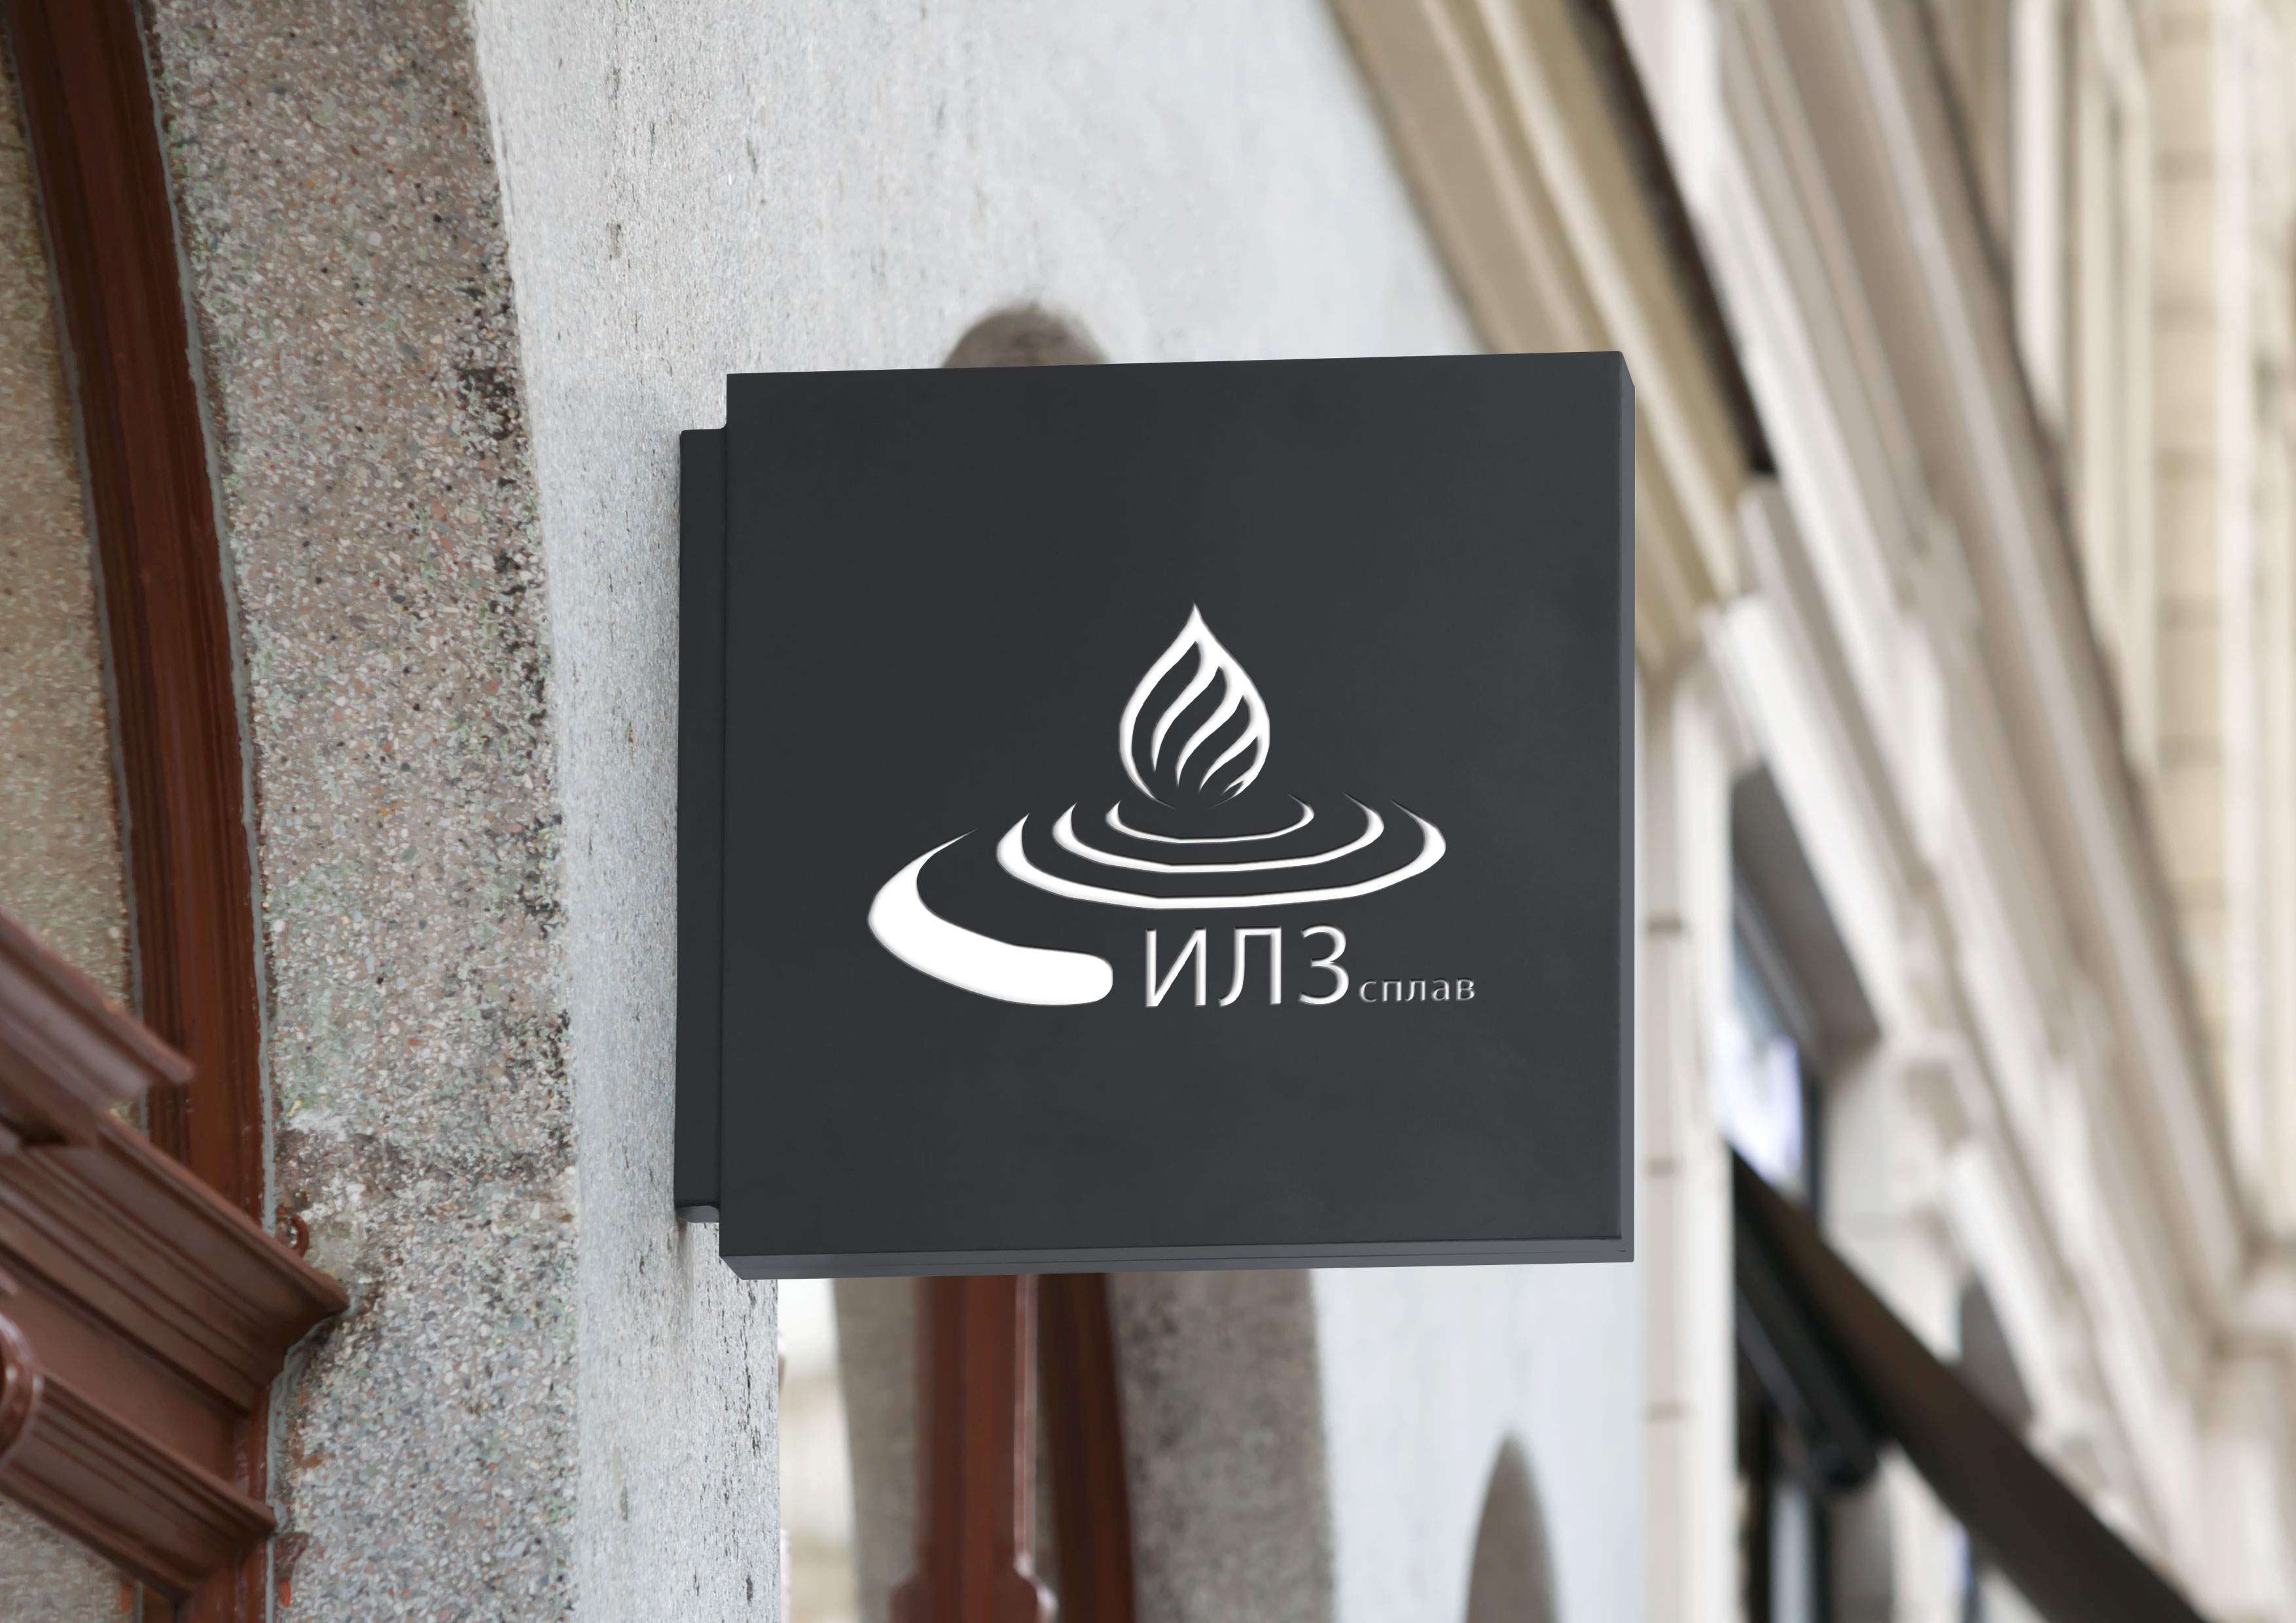 Разработать логотип для литейного завода фото f_0075b002f71baf2d.jpg